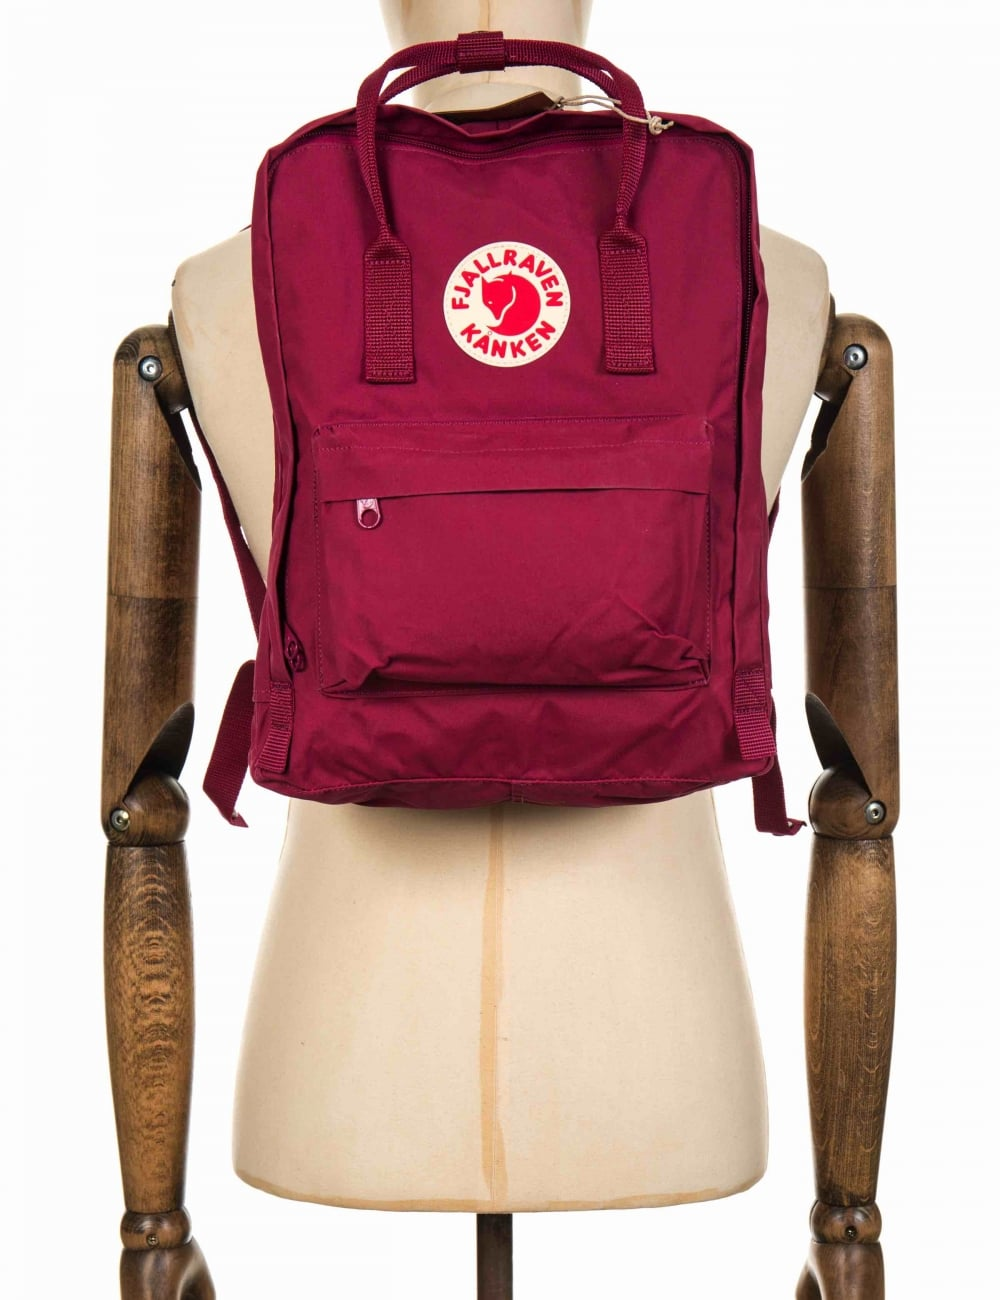 48ecbeaacb637 Fjallraven Kanken Classic Backpack - Plum - Accessories from Fat ...